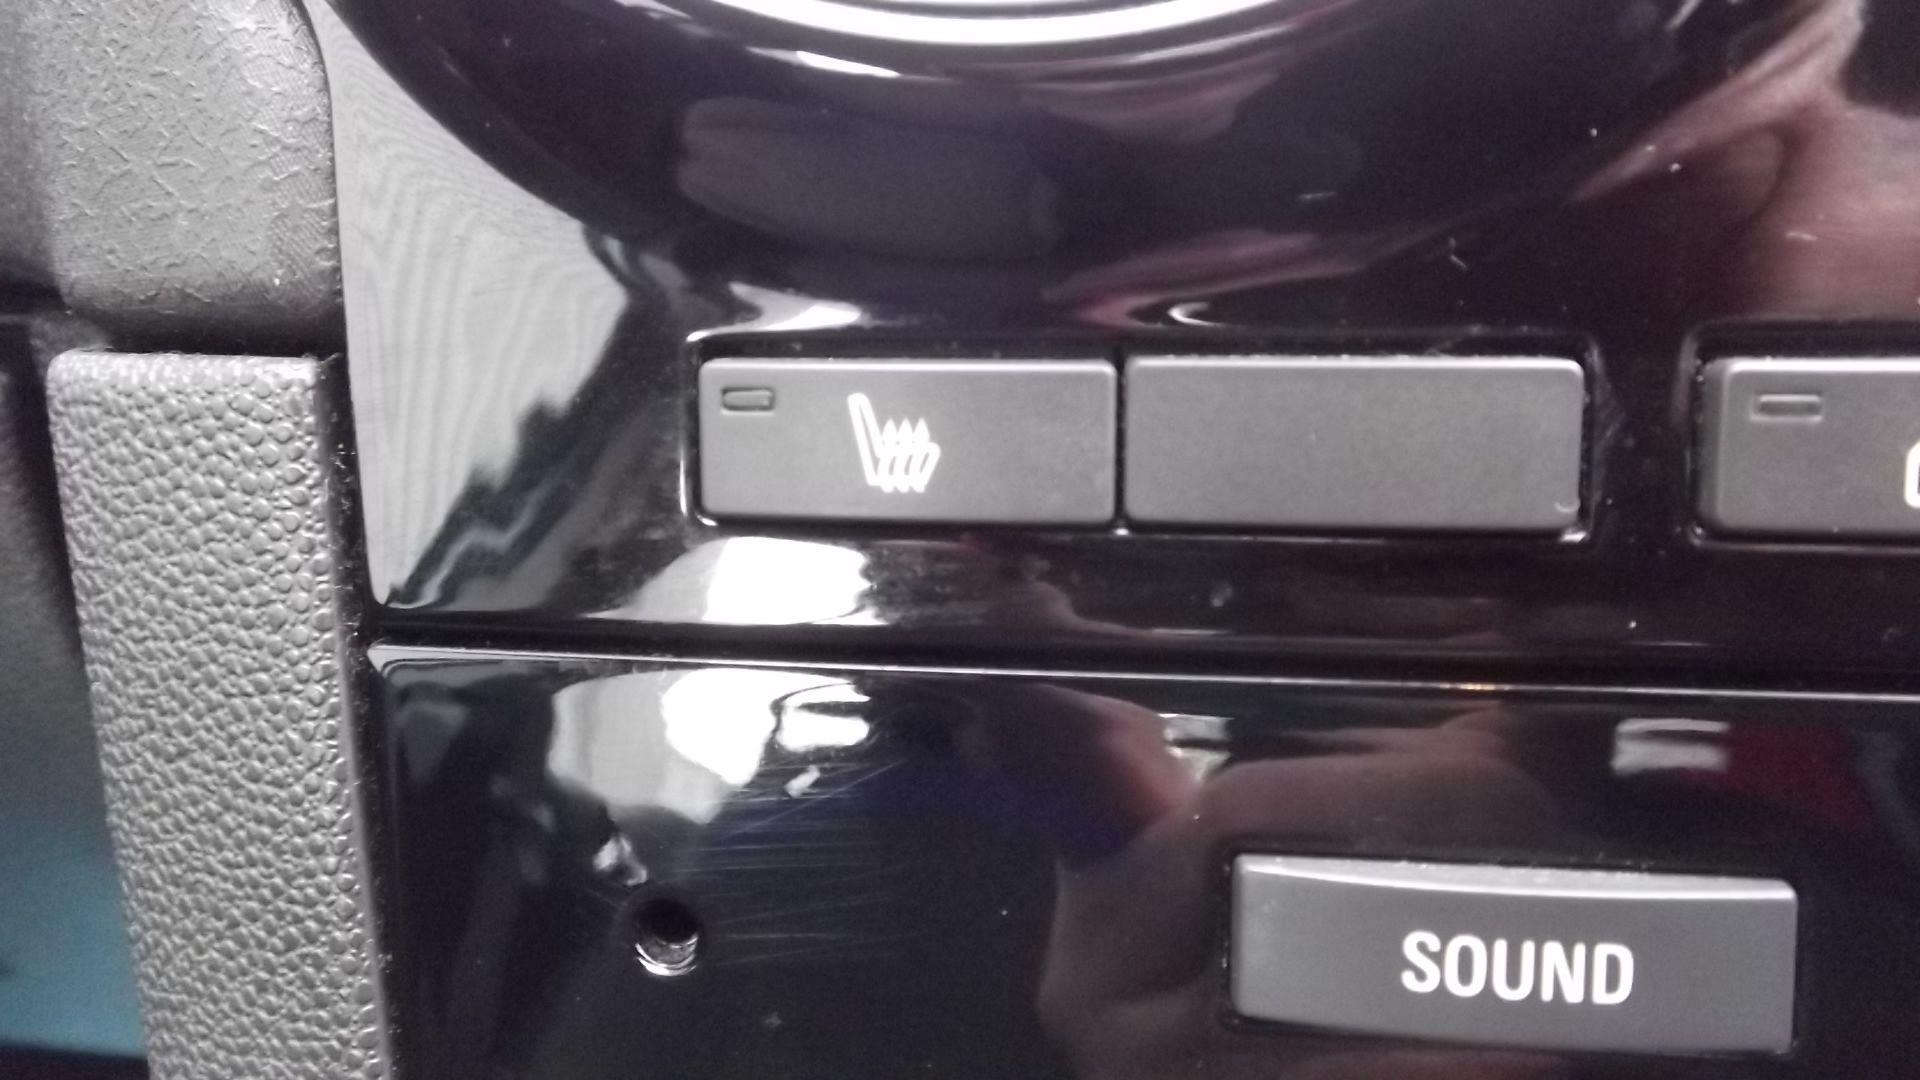 2014 Vauxhall Corsa Se 5Dr Hatchback - Full Service History - CL505 - NO VAT ON THE HAMMER - - Image 11 of 24